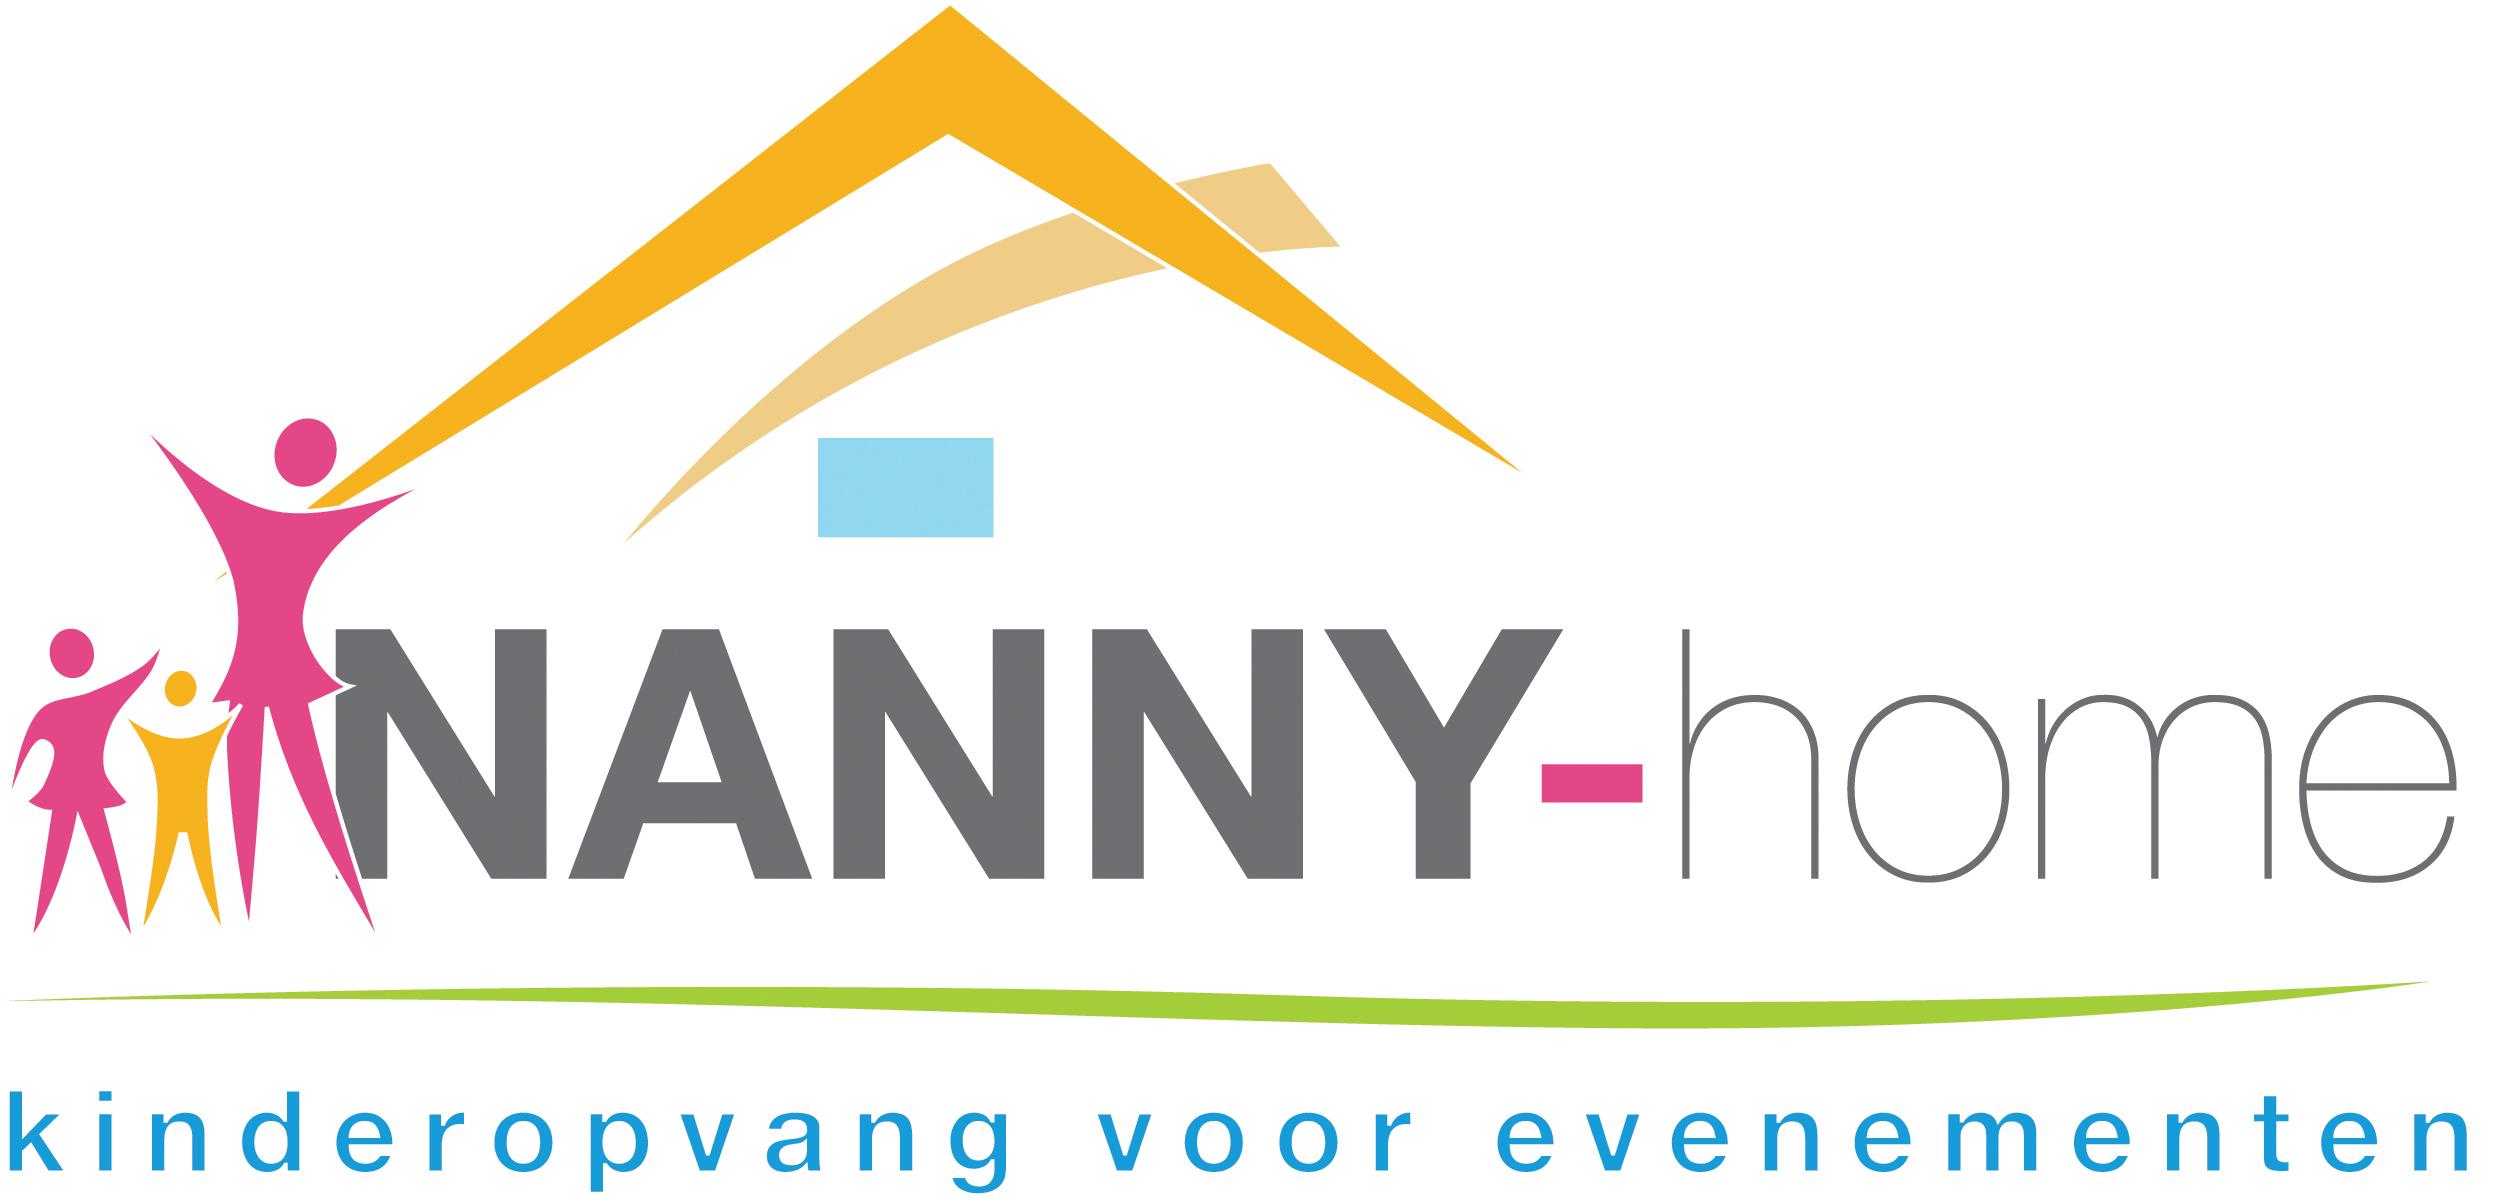 Nanny-home evenementen